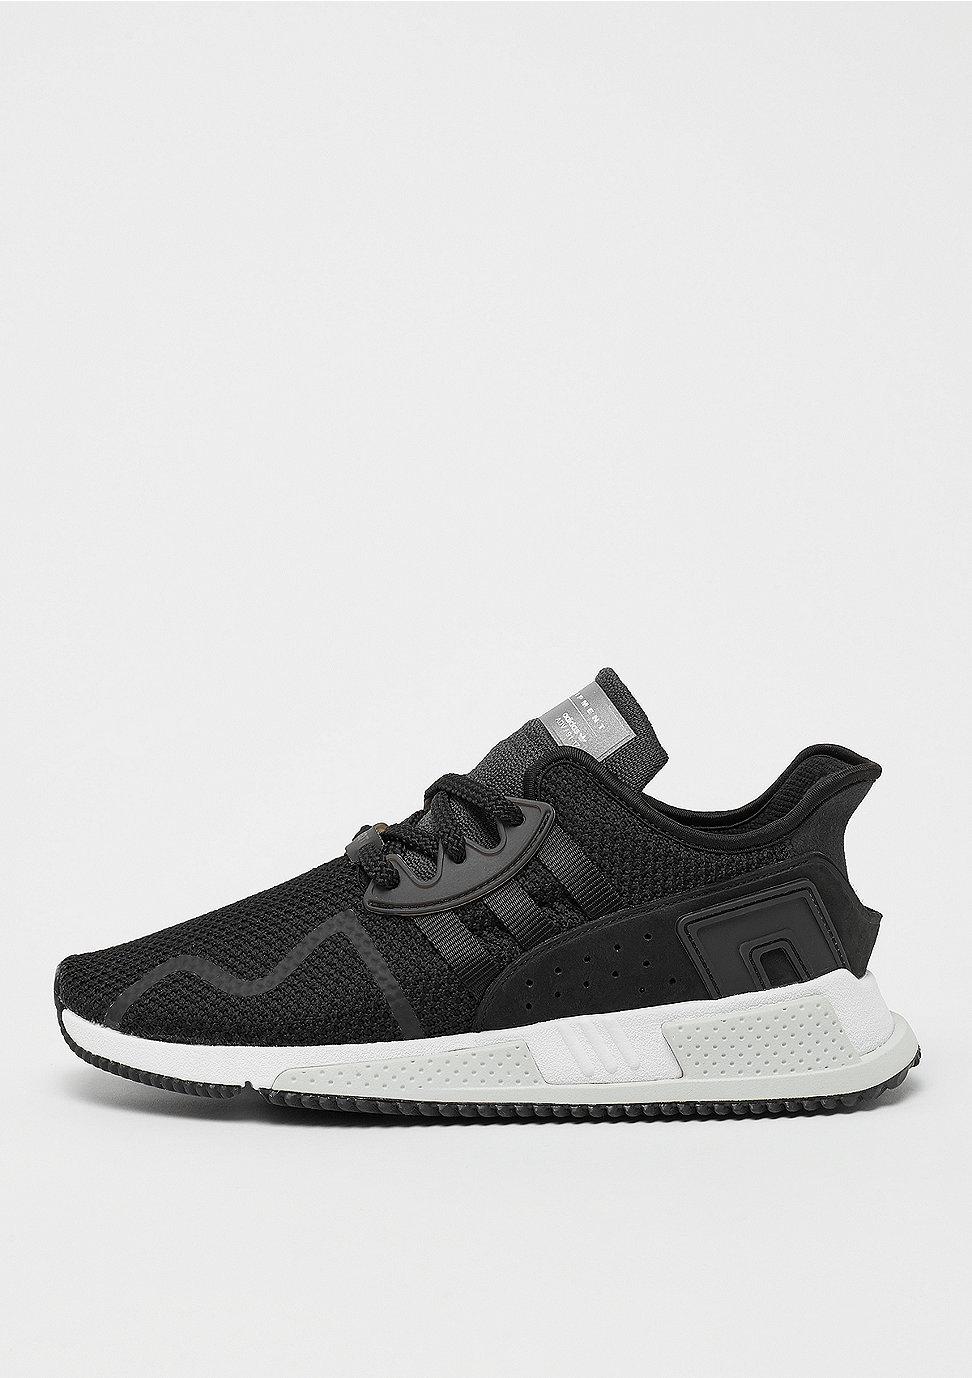 separation shoes a0998 efa91 adidas EQT Cushion ADV core blackcore blackftwr white Sneakers bij SNIPES  bestellen